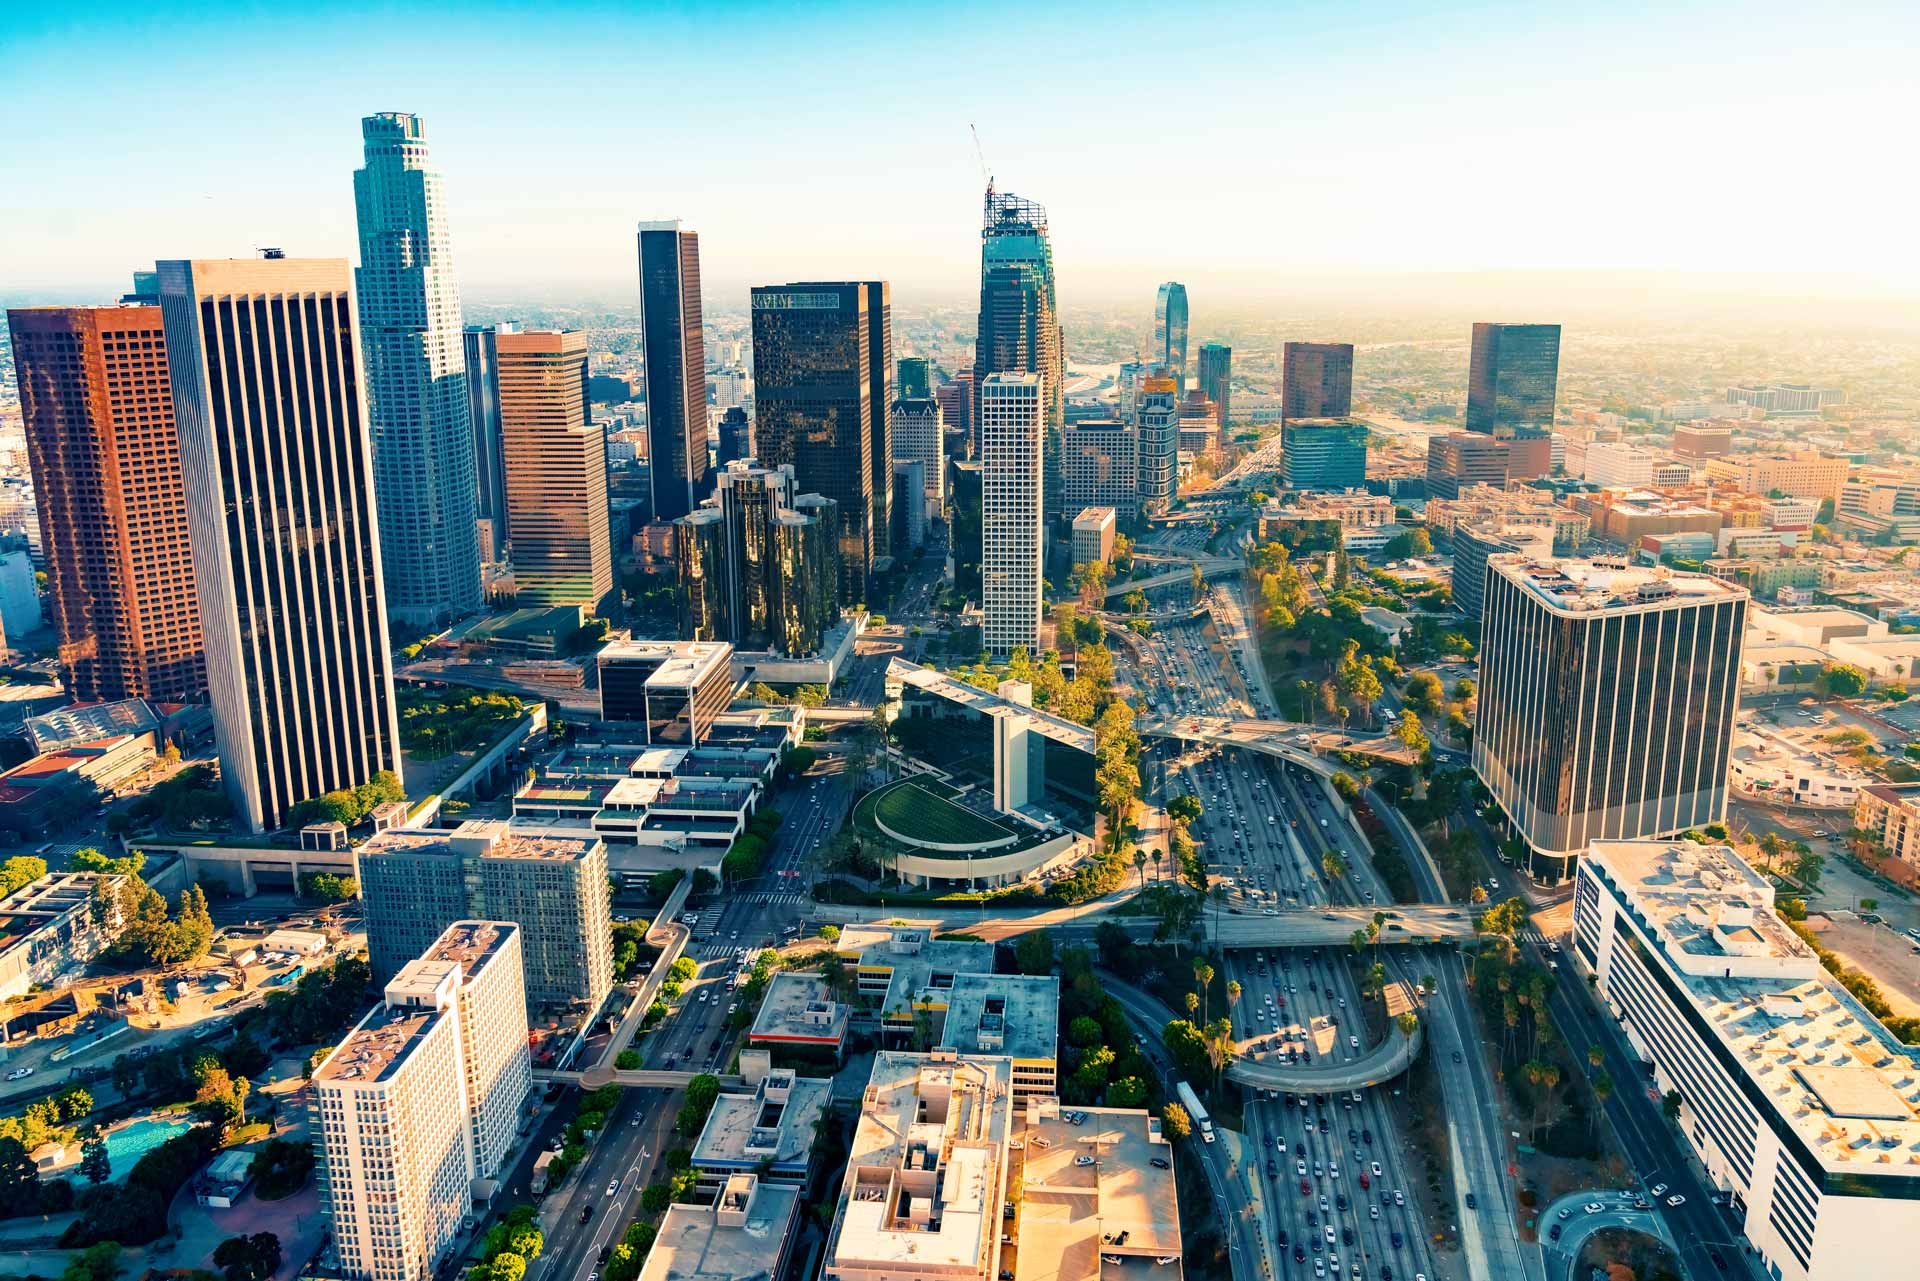 Smart city, smart home, smart citizen